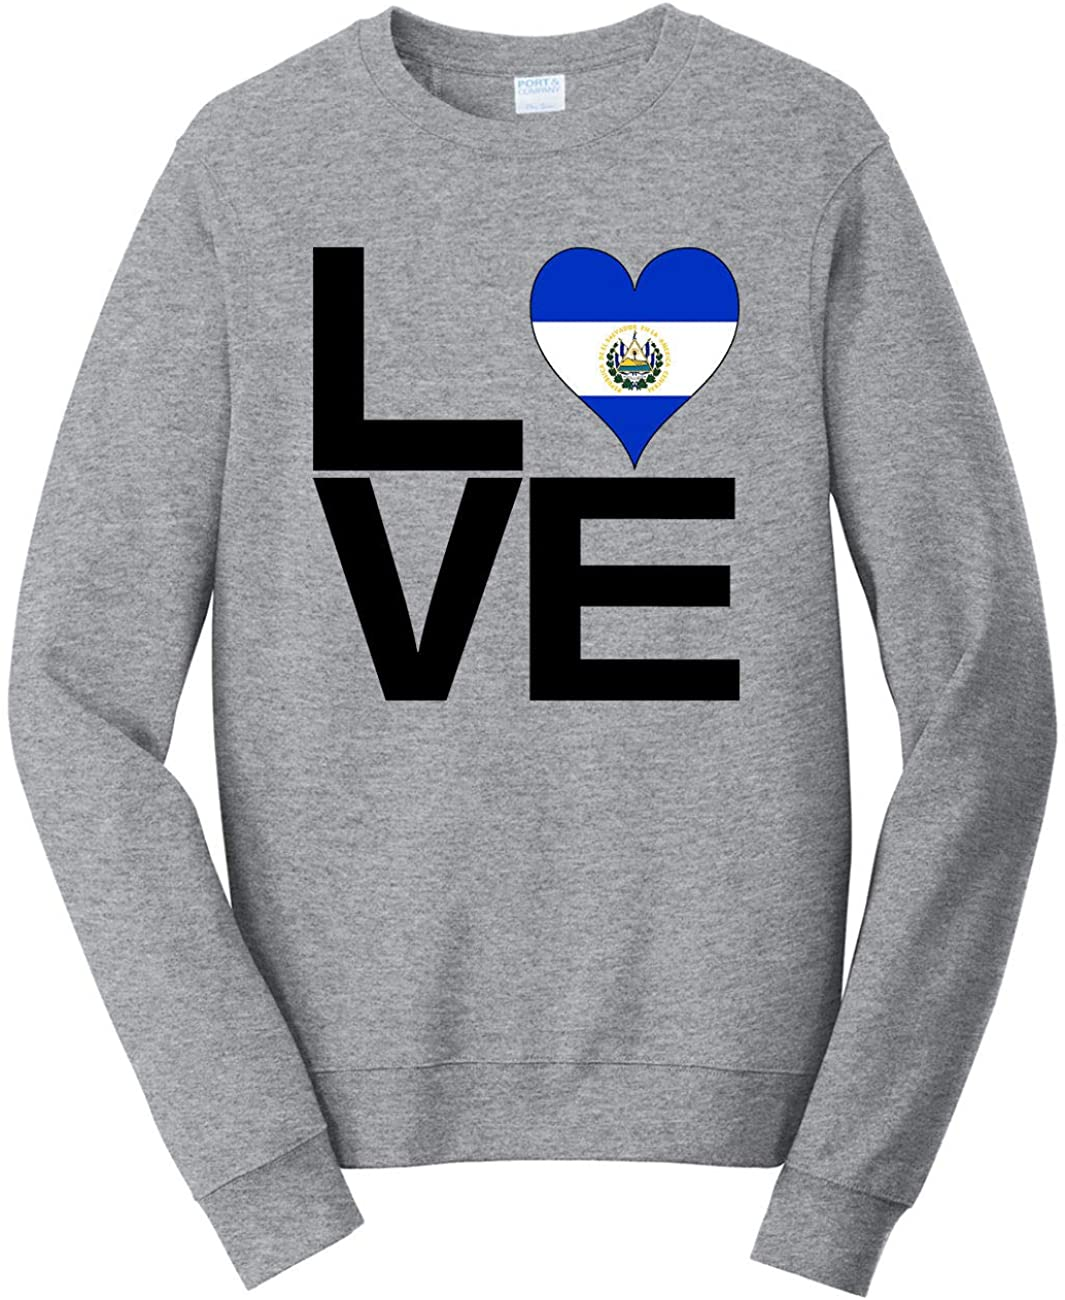 HARD EDGE DESIGN Unisex Love Block El Salvador Heart Sweatshirt, 4X-Large, Heather Grey